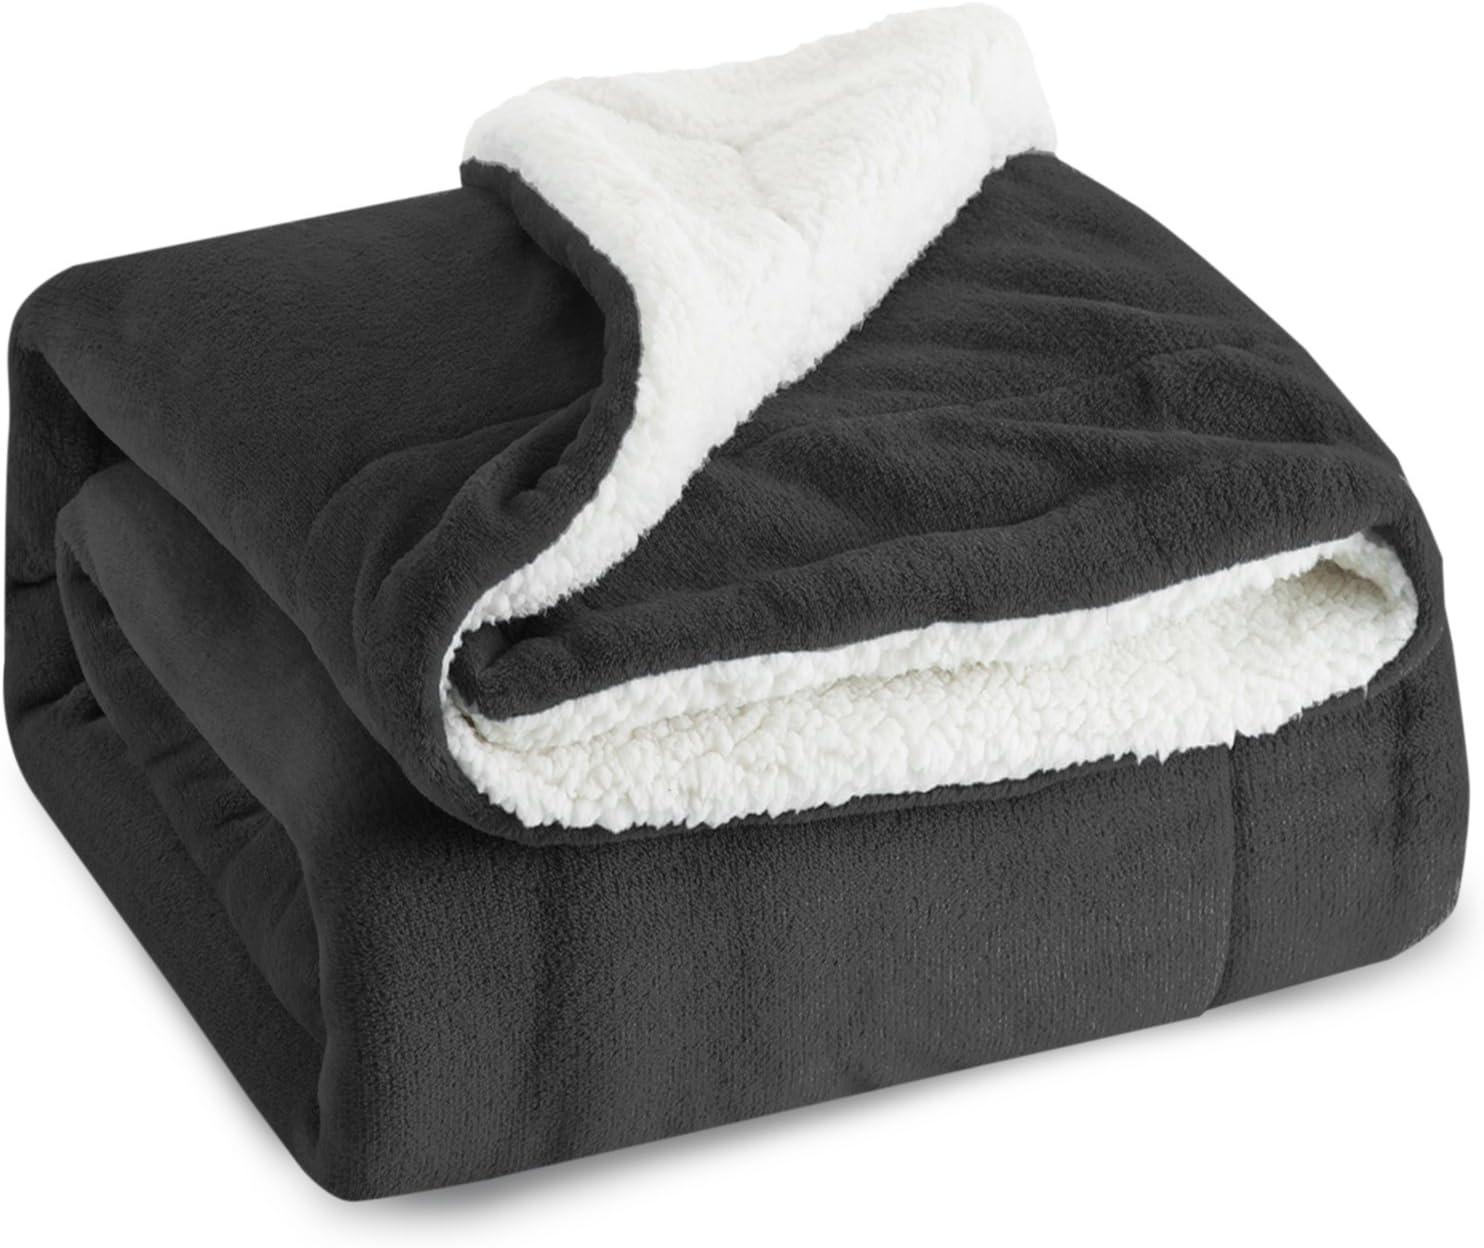 BEDSURE Sherpa Fleece Blanket Twin Size Dark Grey Plush Throw Blanket Fuzzy Soft Blanket Microfiber